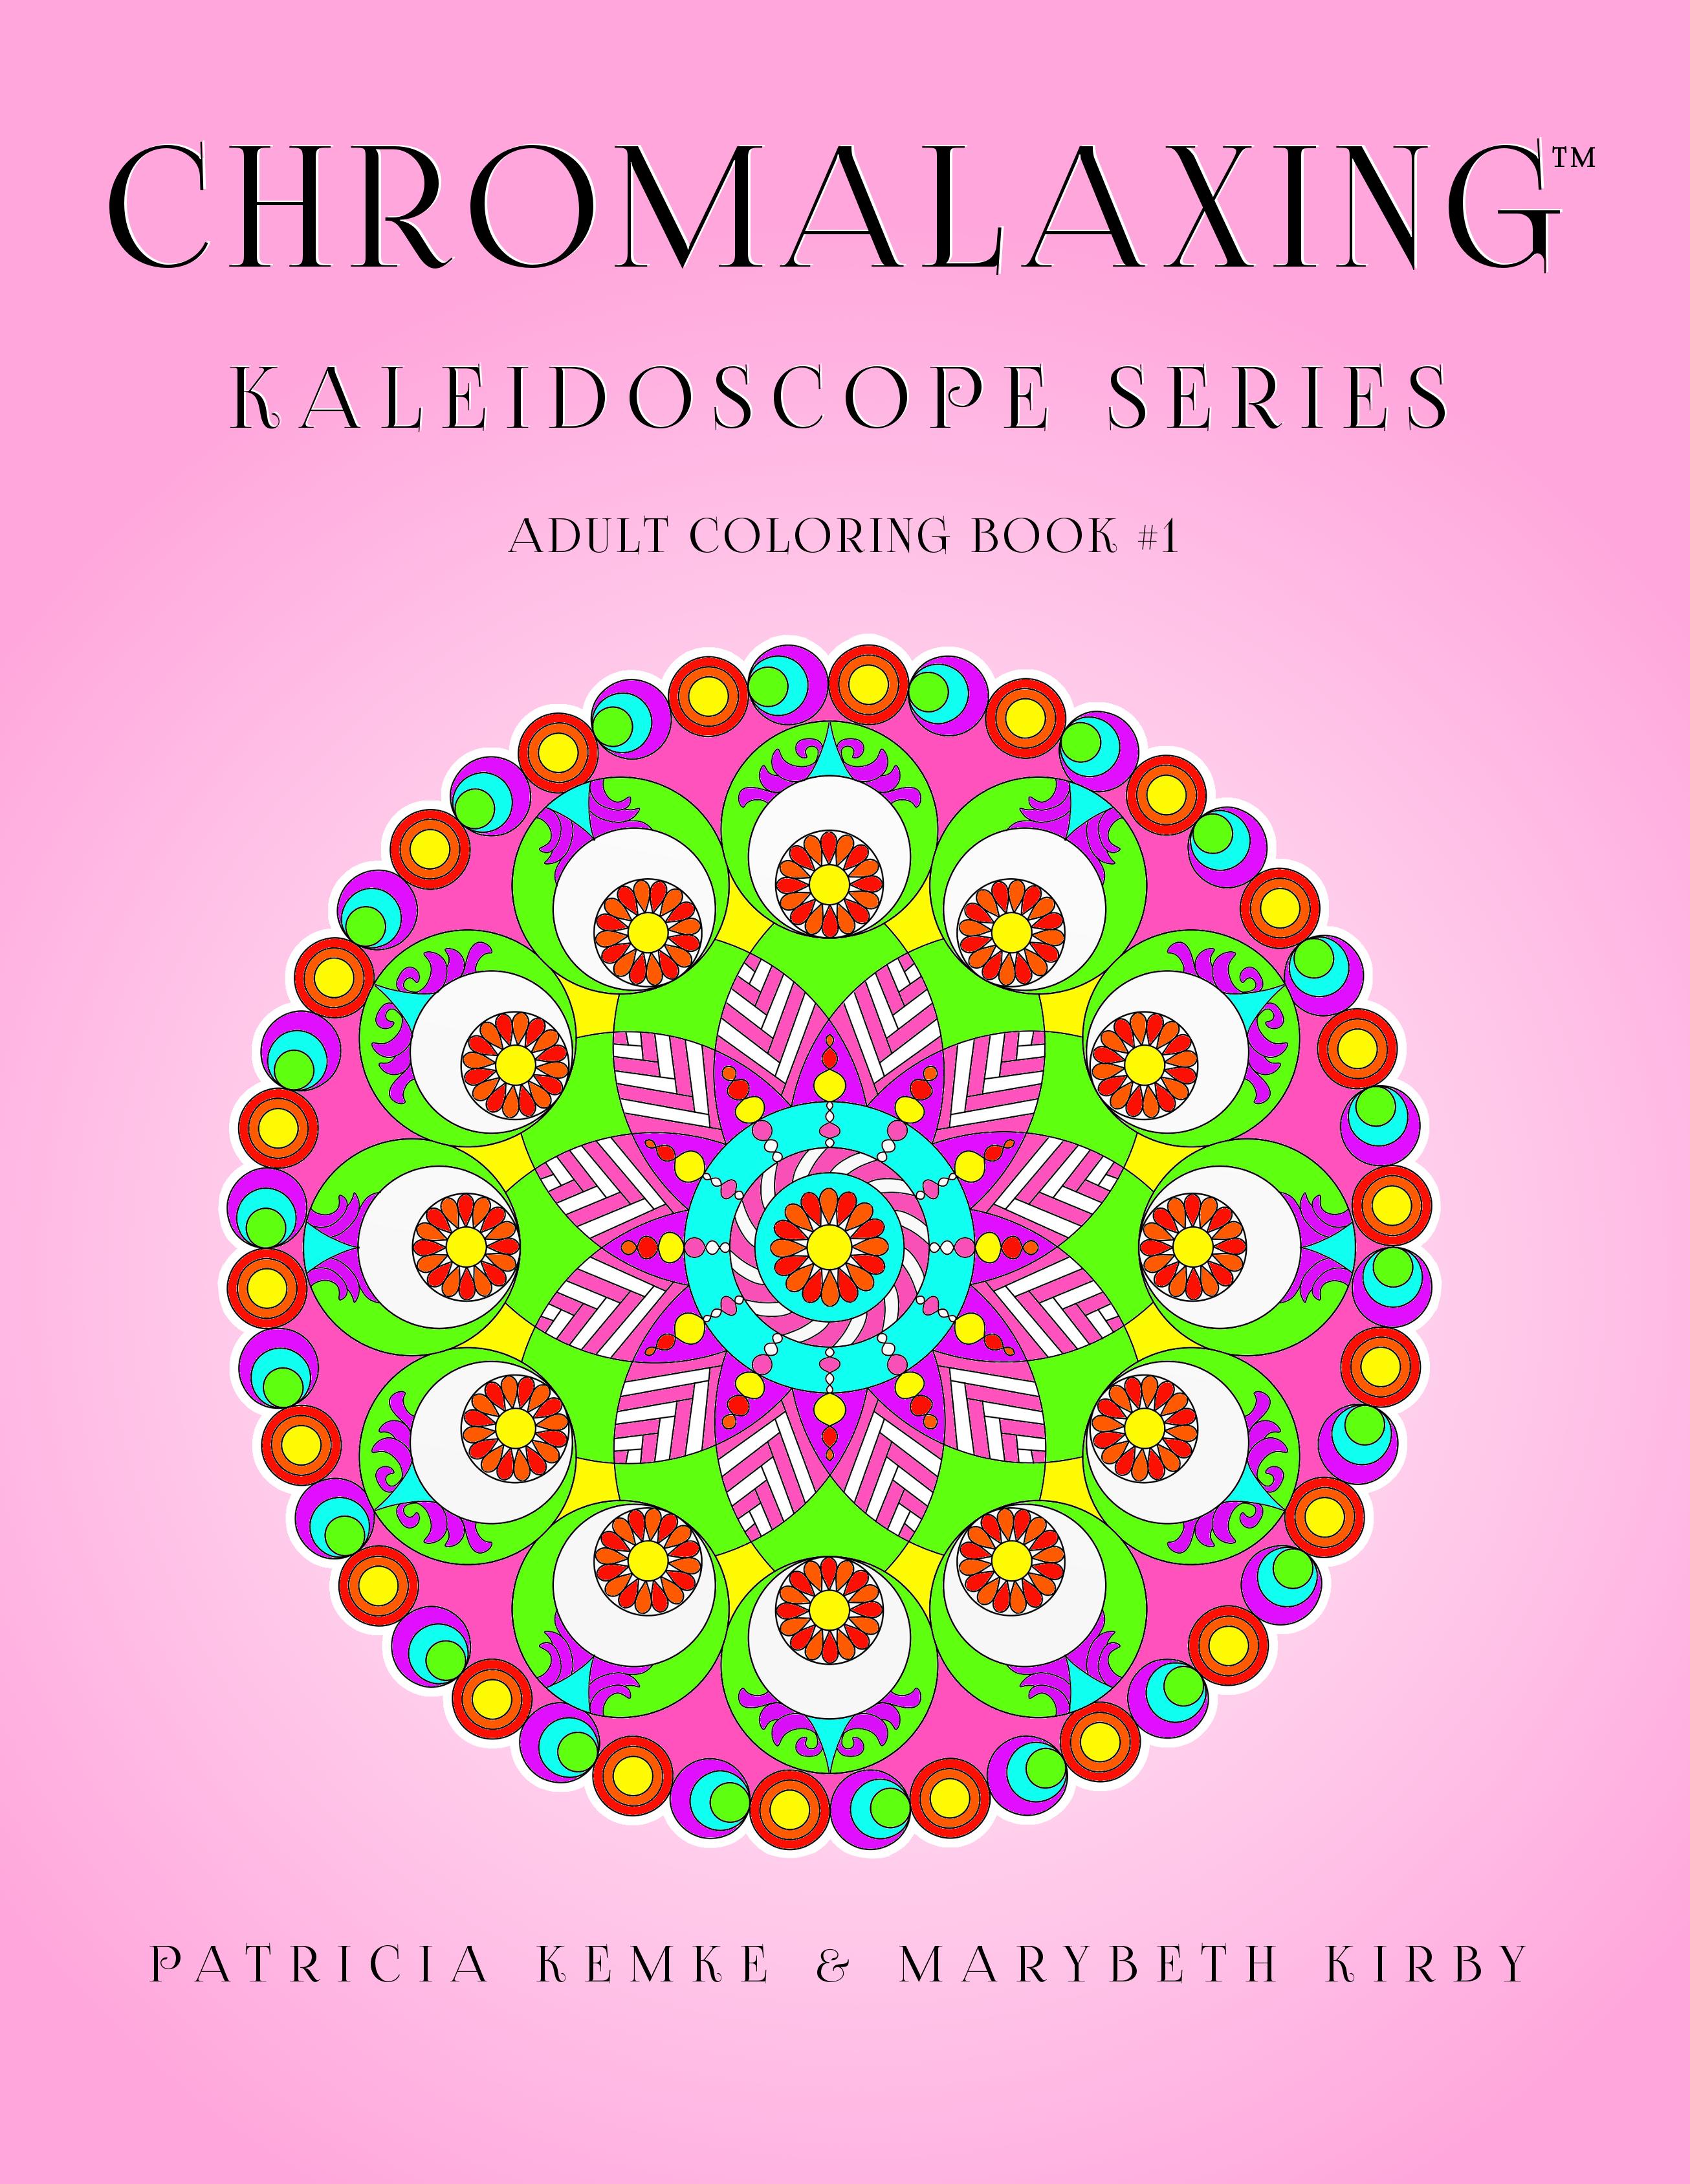 Chromalaxing Kaleidoscope Series Adult Coloring Book 1